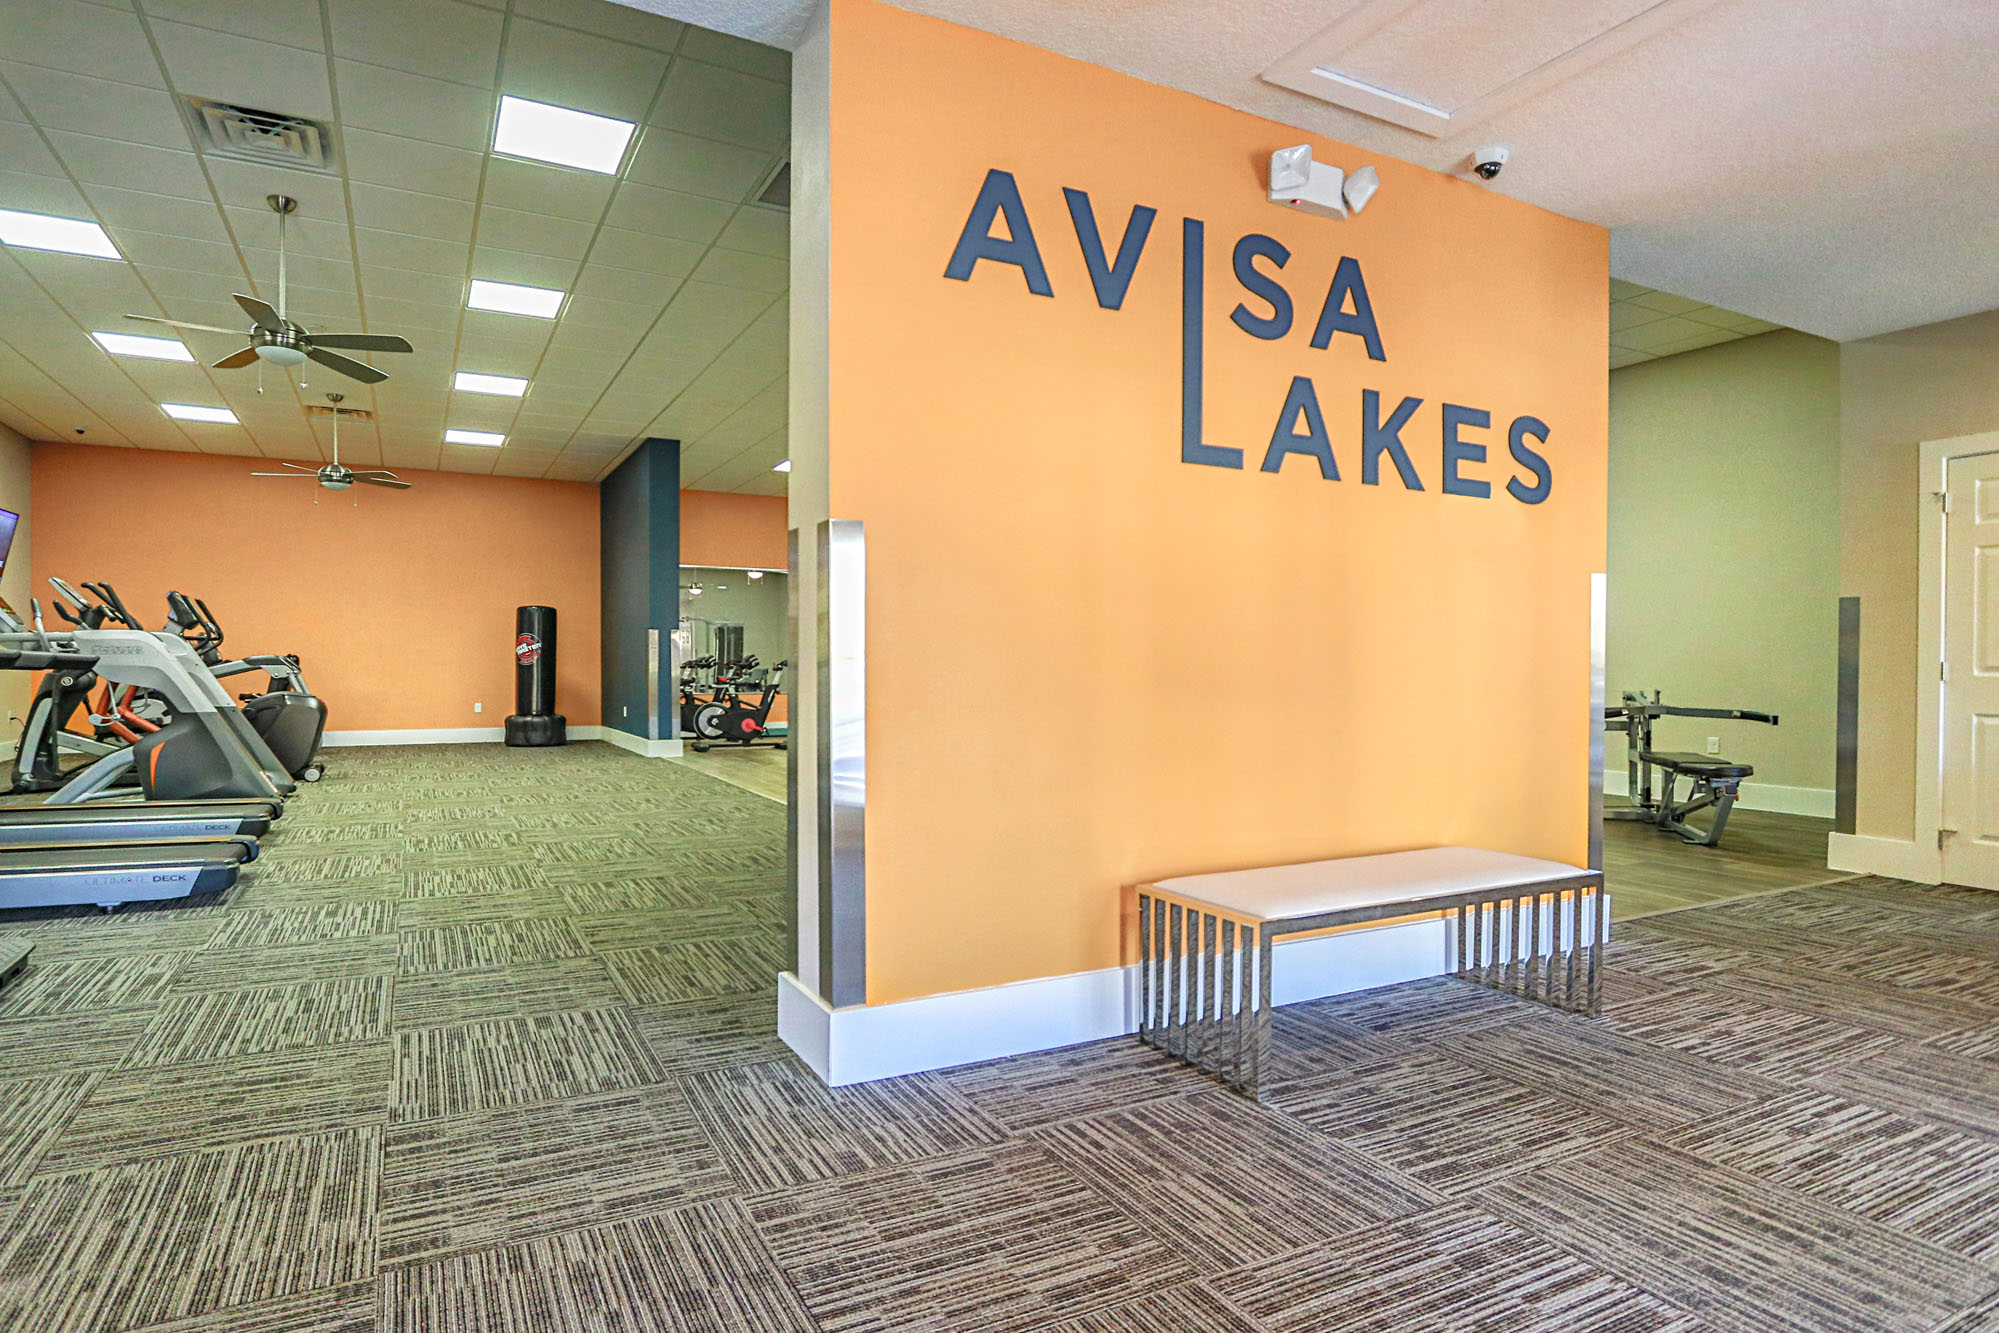 Live at Avisa Lakes